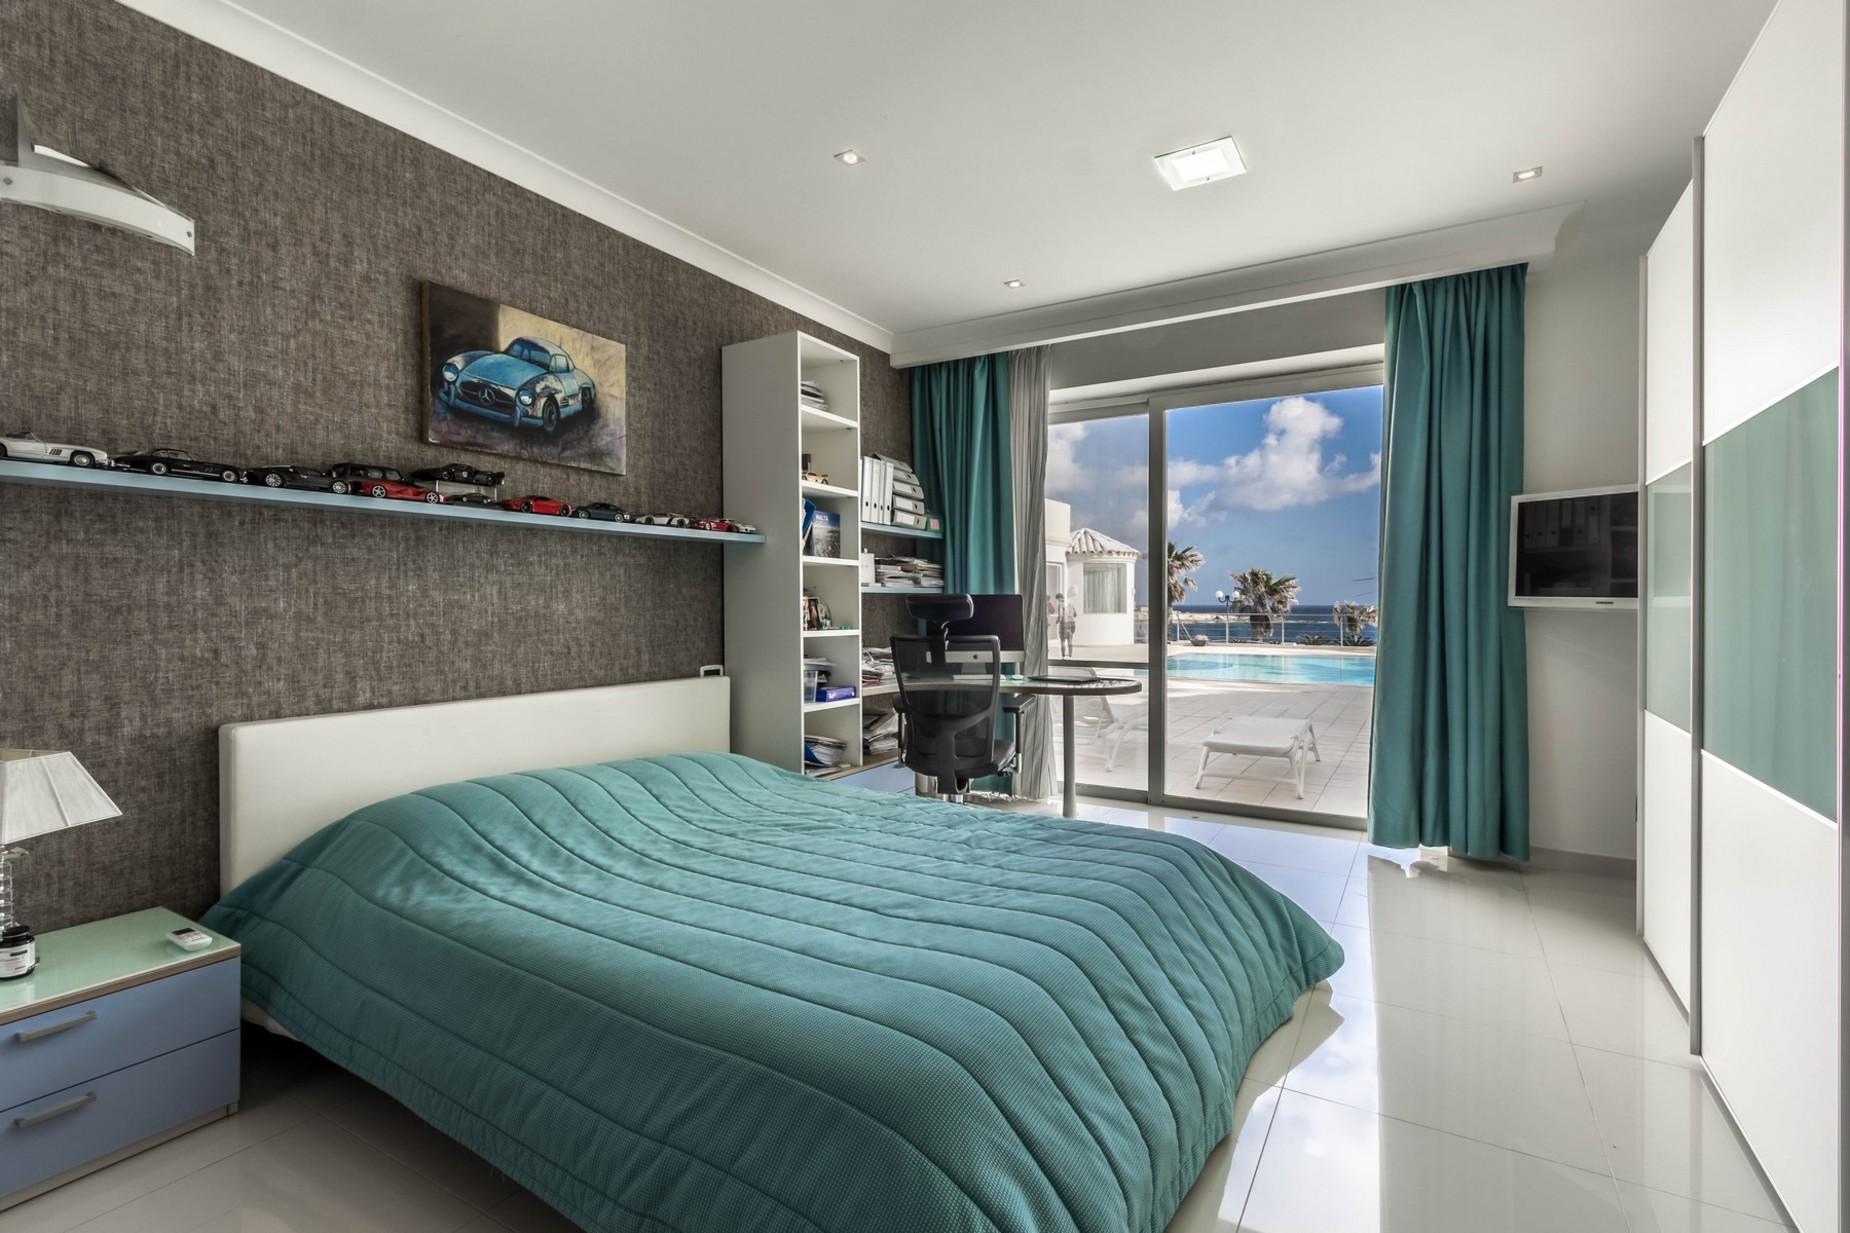 4 bed Villa For Sale in Marsascala, Marsascala - thumb 25